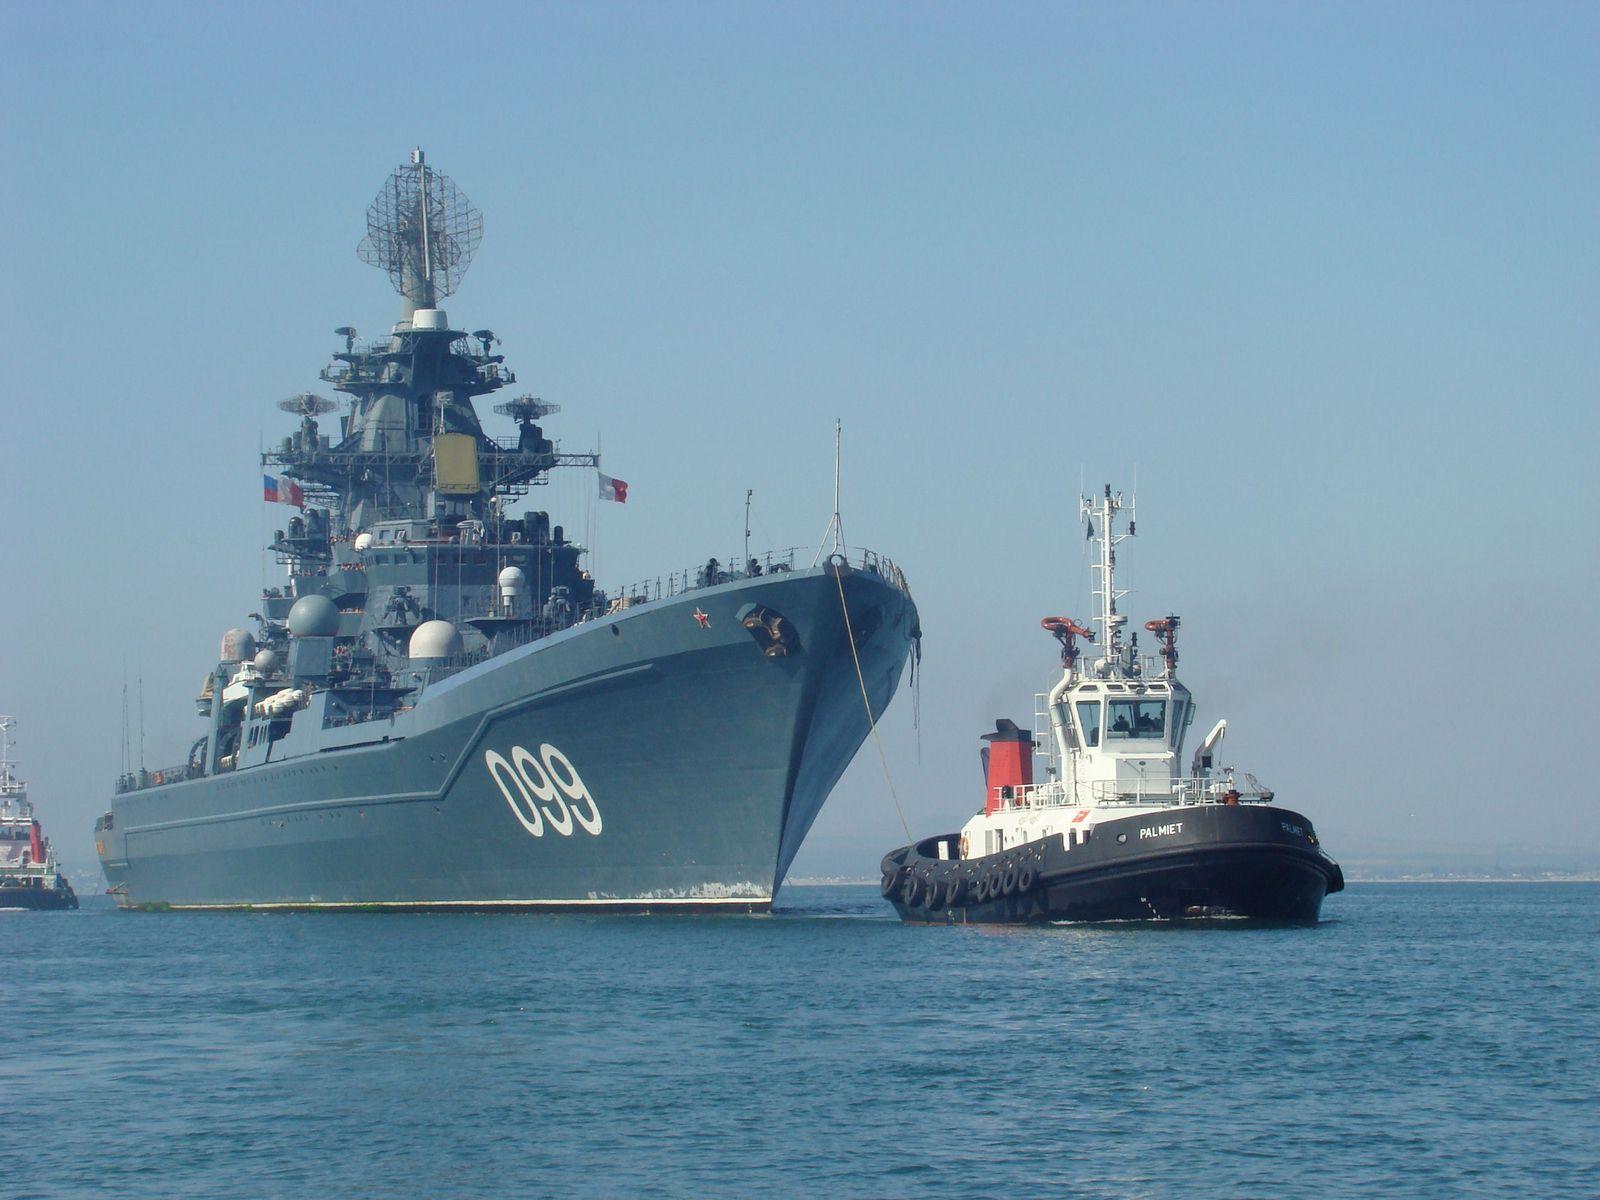 kirov class cruiser pyotr velikiy099 being tescorted by two tugs1600x1200